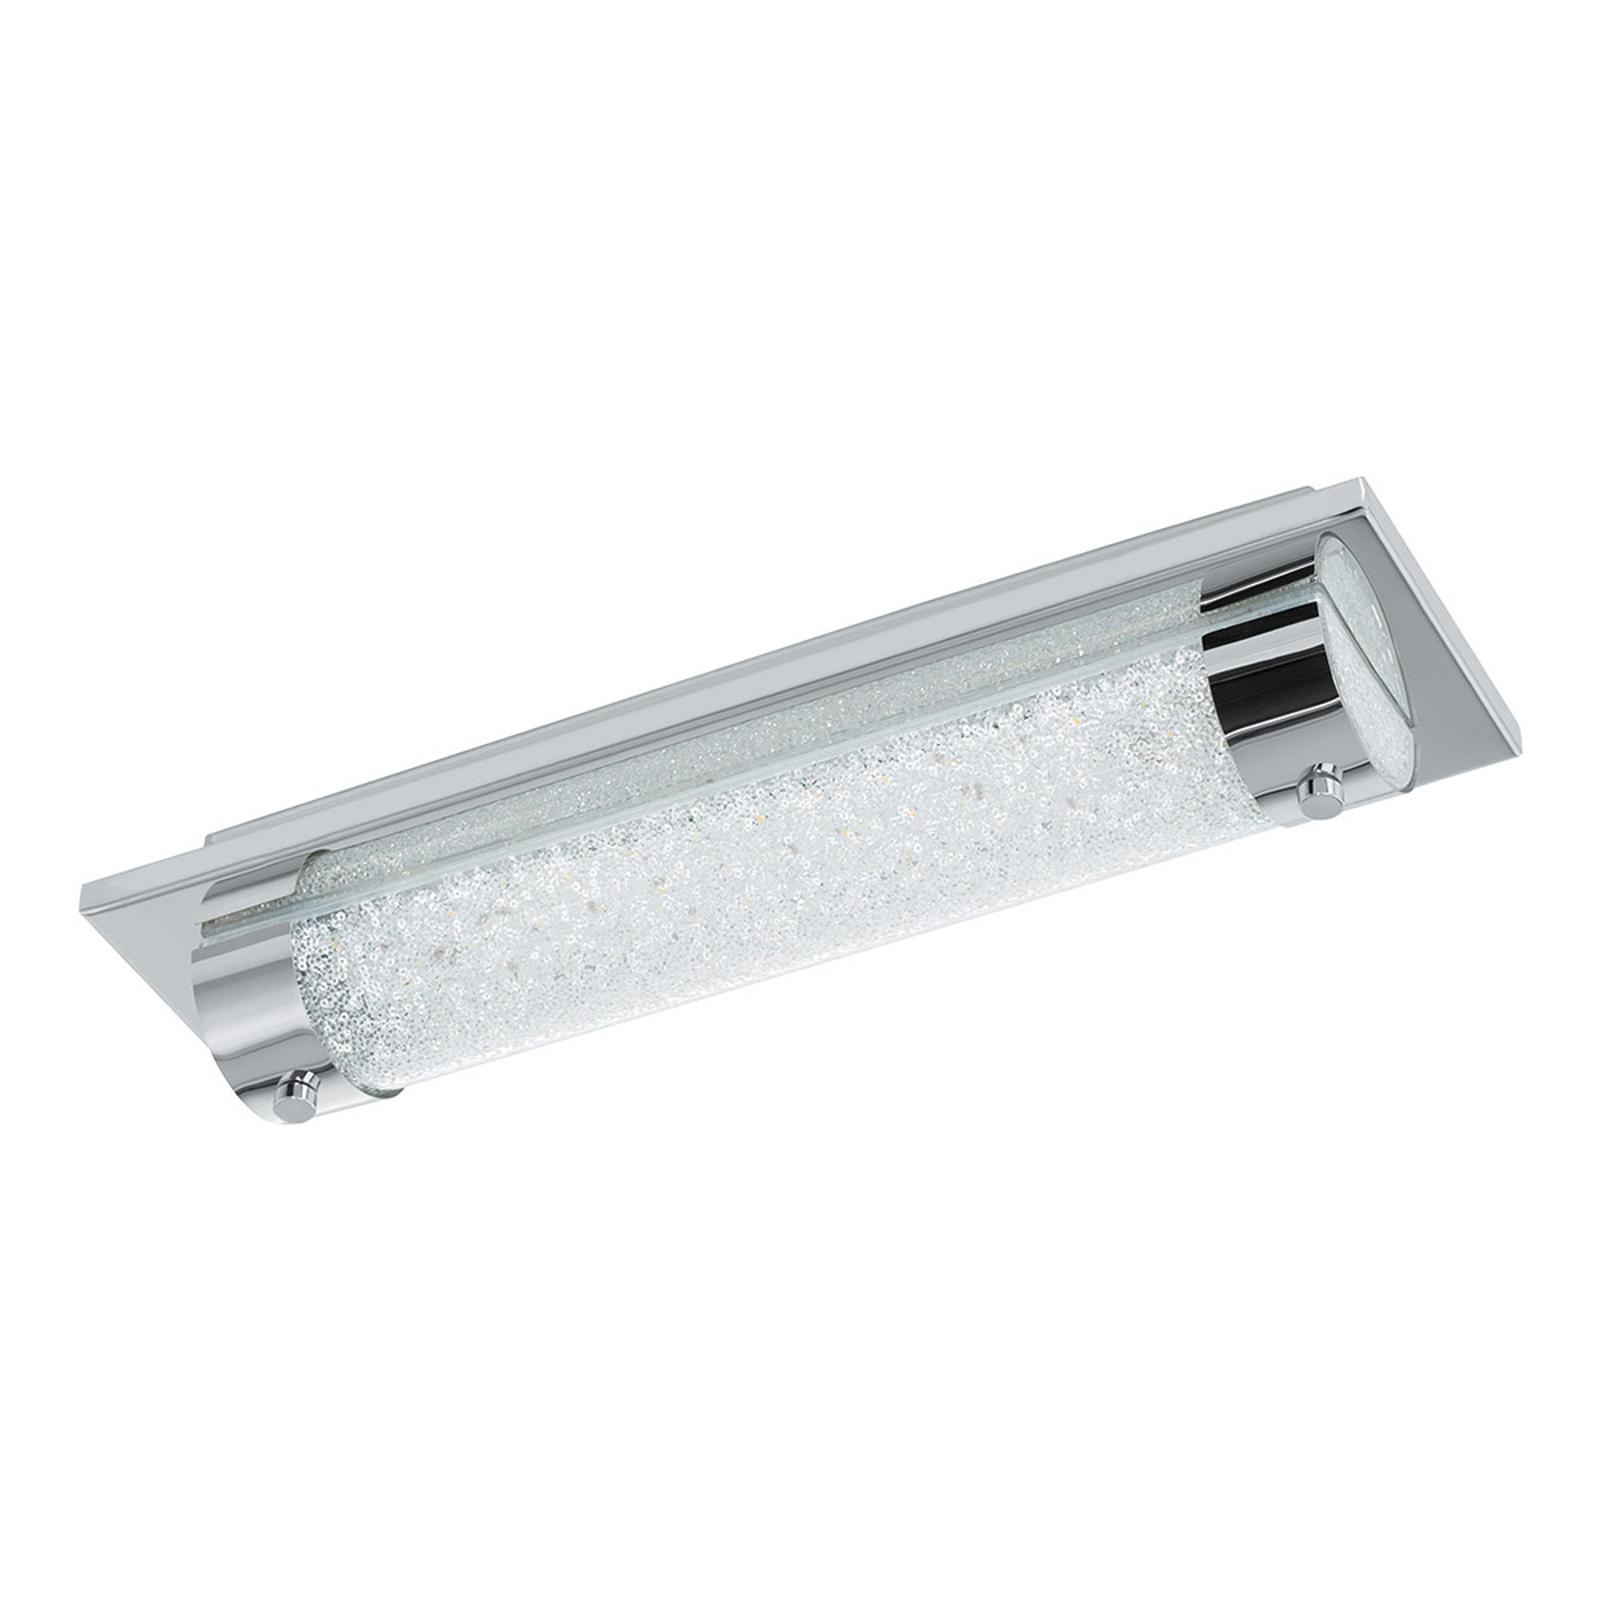 Lampa sufitowa LED Tolorico, długość 35 cm